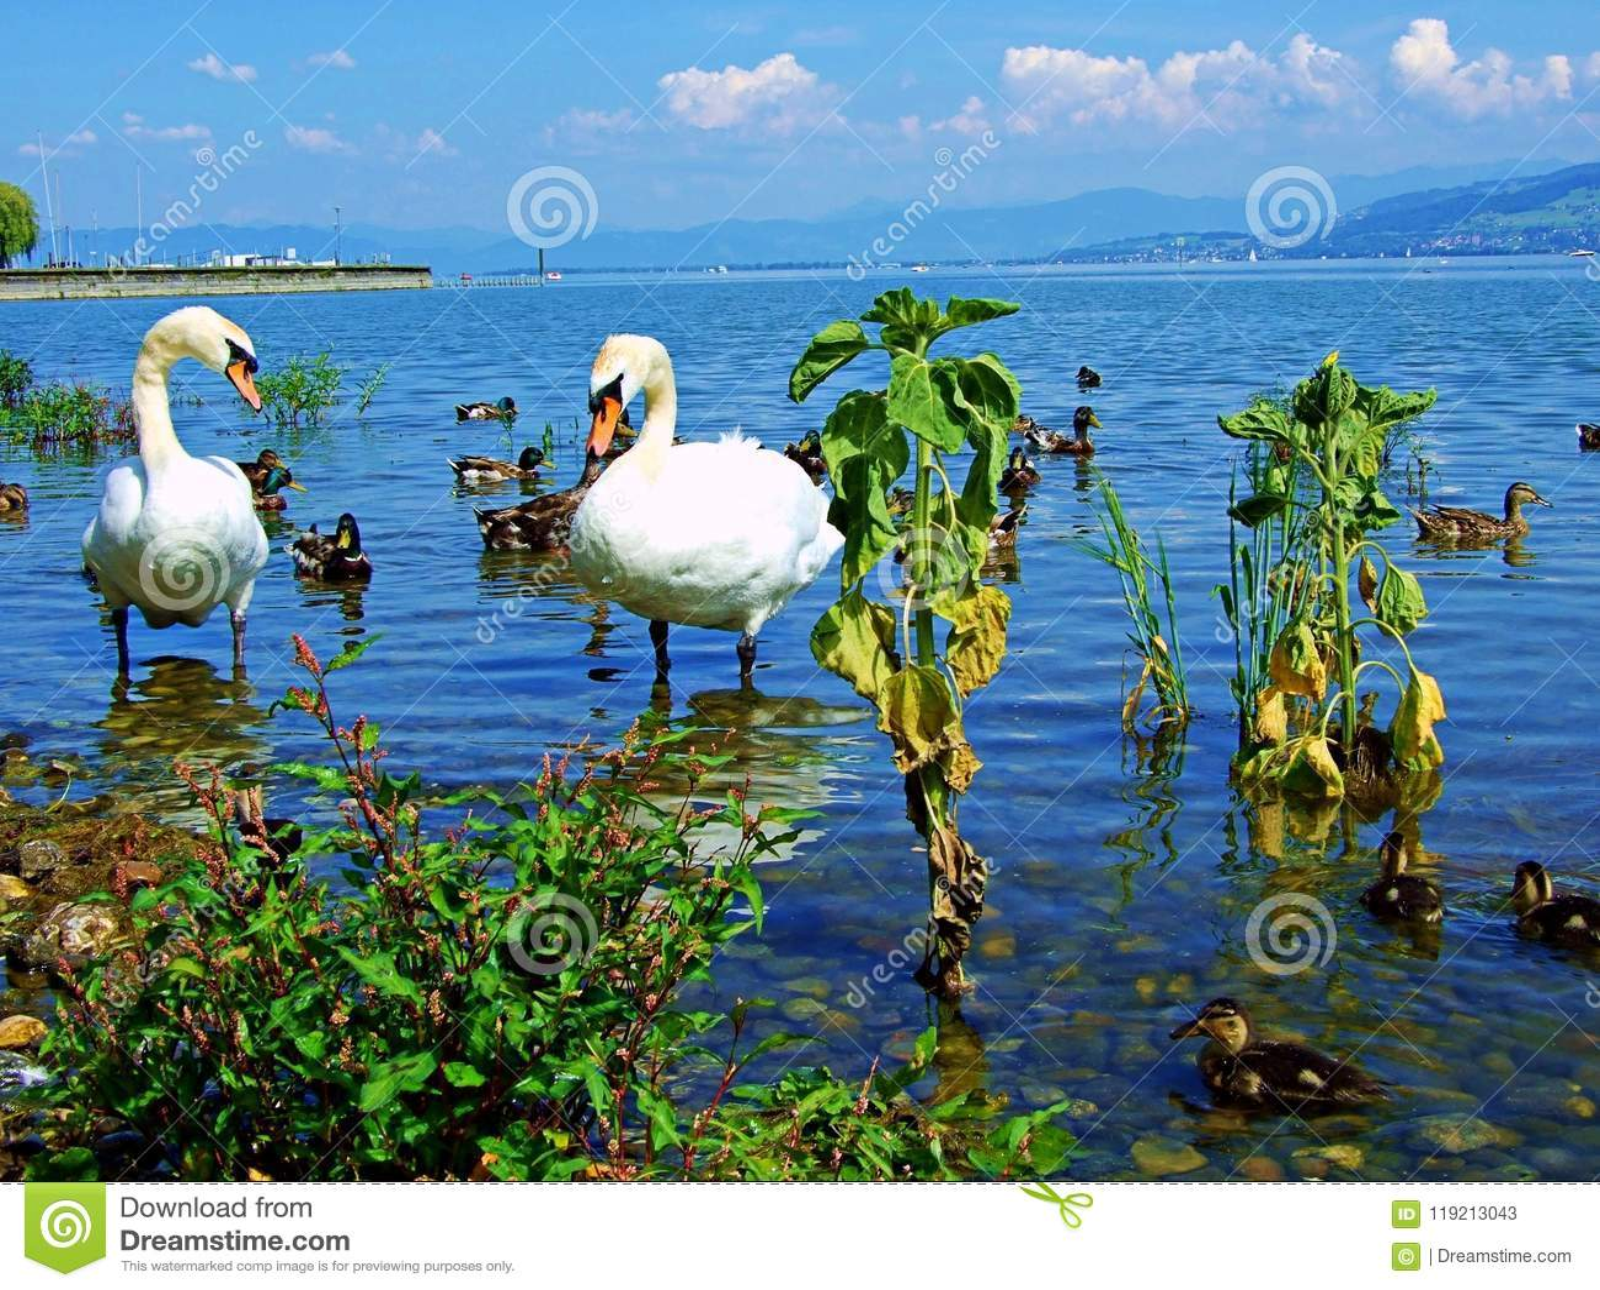 Image of: Cute Swan Water Bird Lake White Nature Animal Swans Birds Beautiful Wildlife Beauty Love River Pond Blue Graceful Elegance Reflection Animals Dreamstimecom Swan Water Bird Lake White Nature Animal Swans Birds